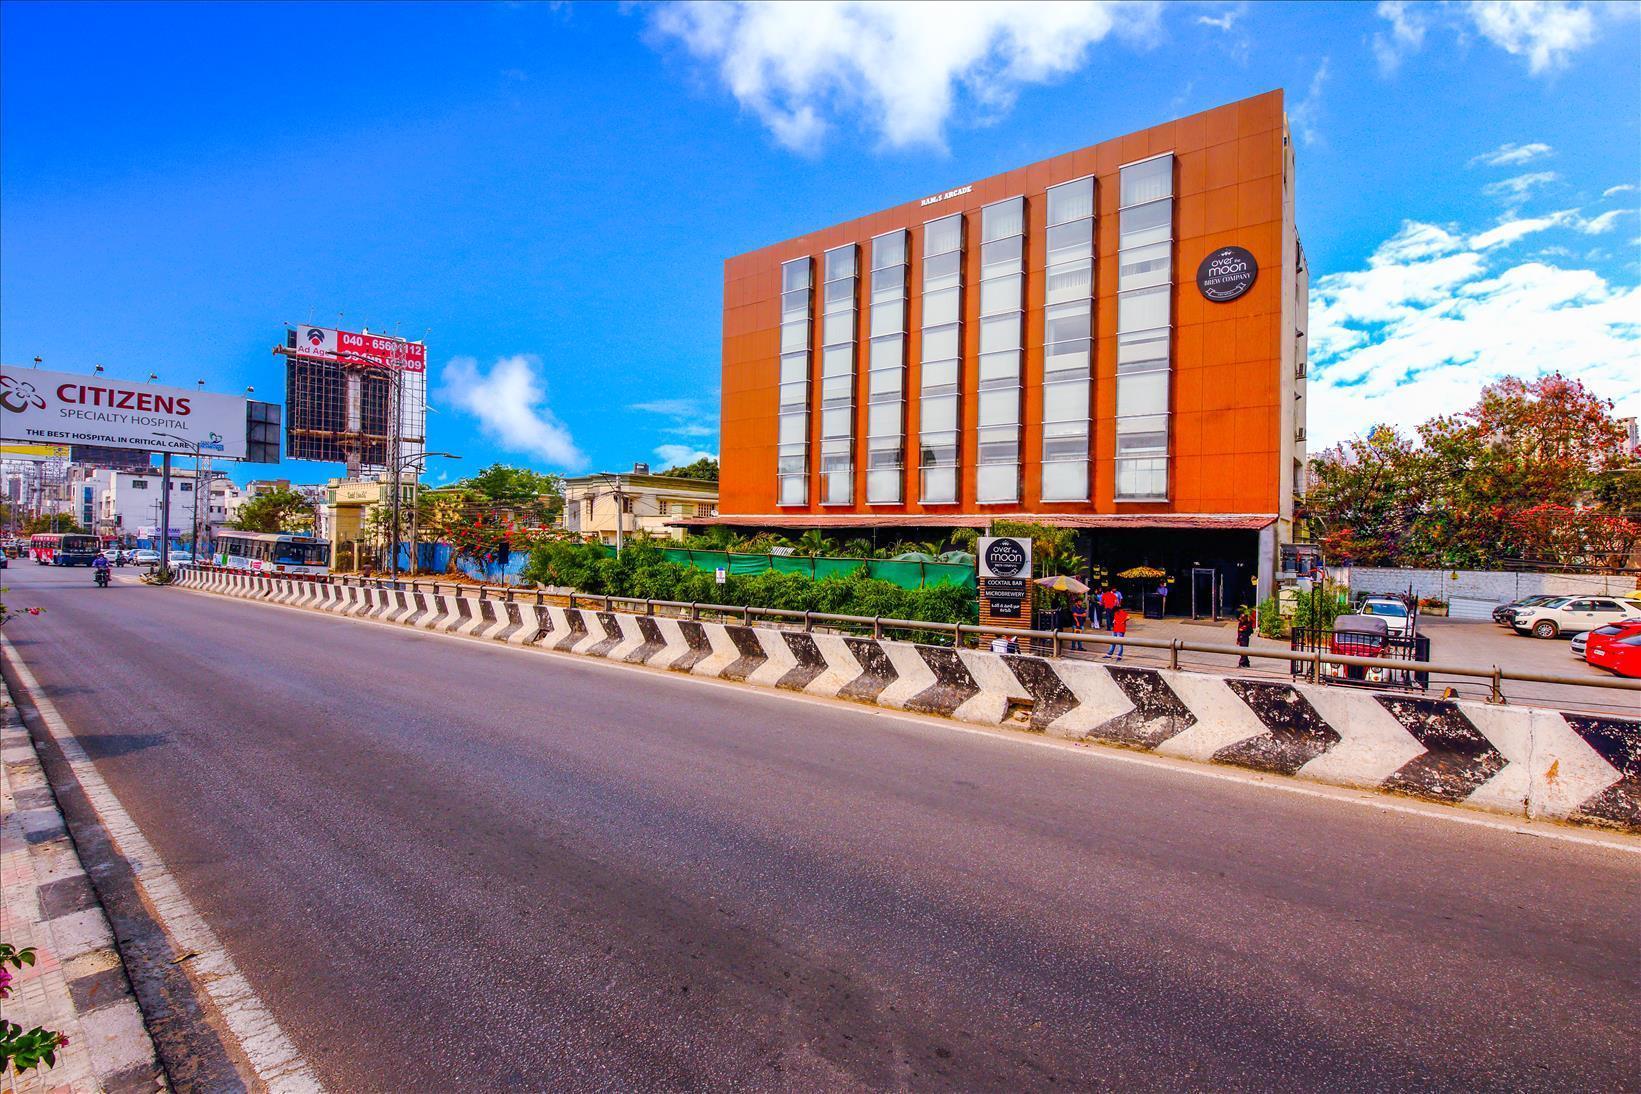 Hotel Mint OTM